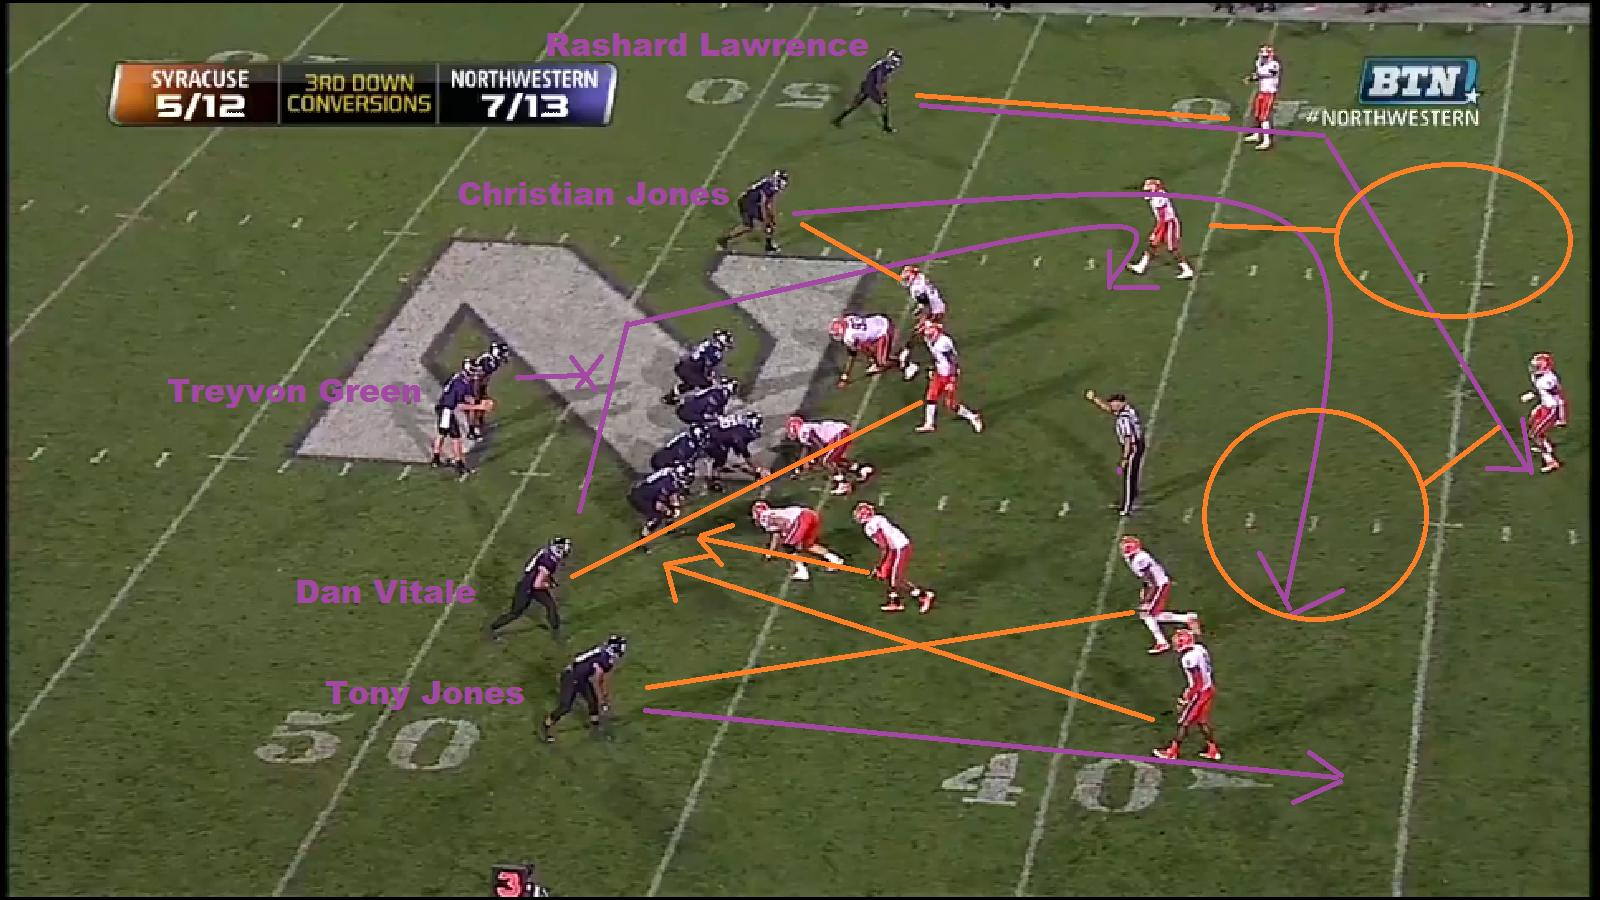 Tony Jones Touchdown Northwestern Syracuse